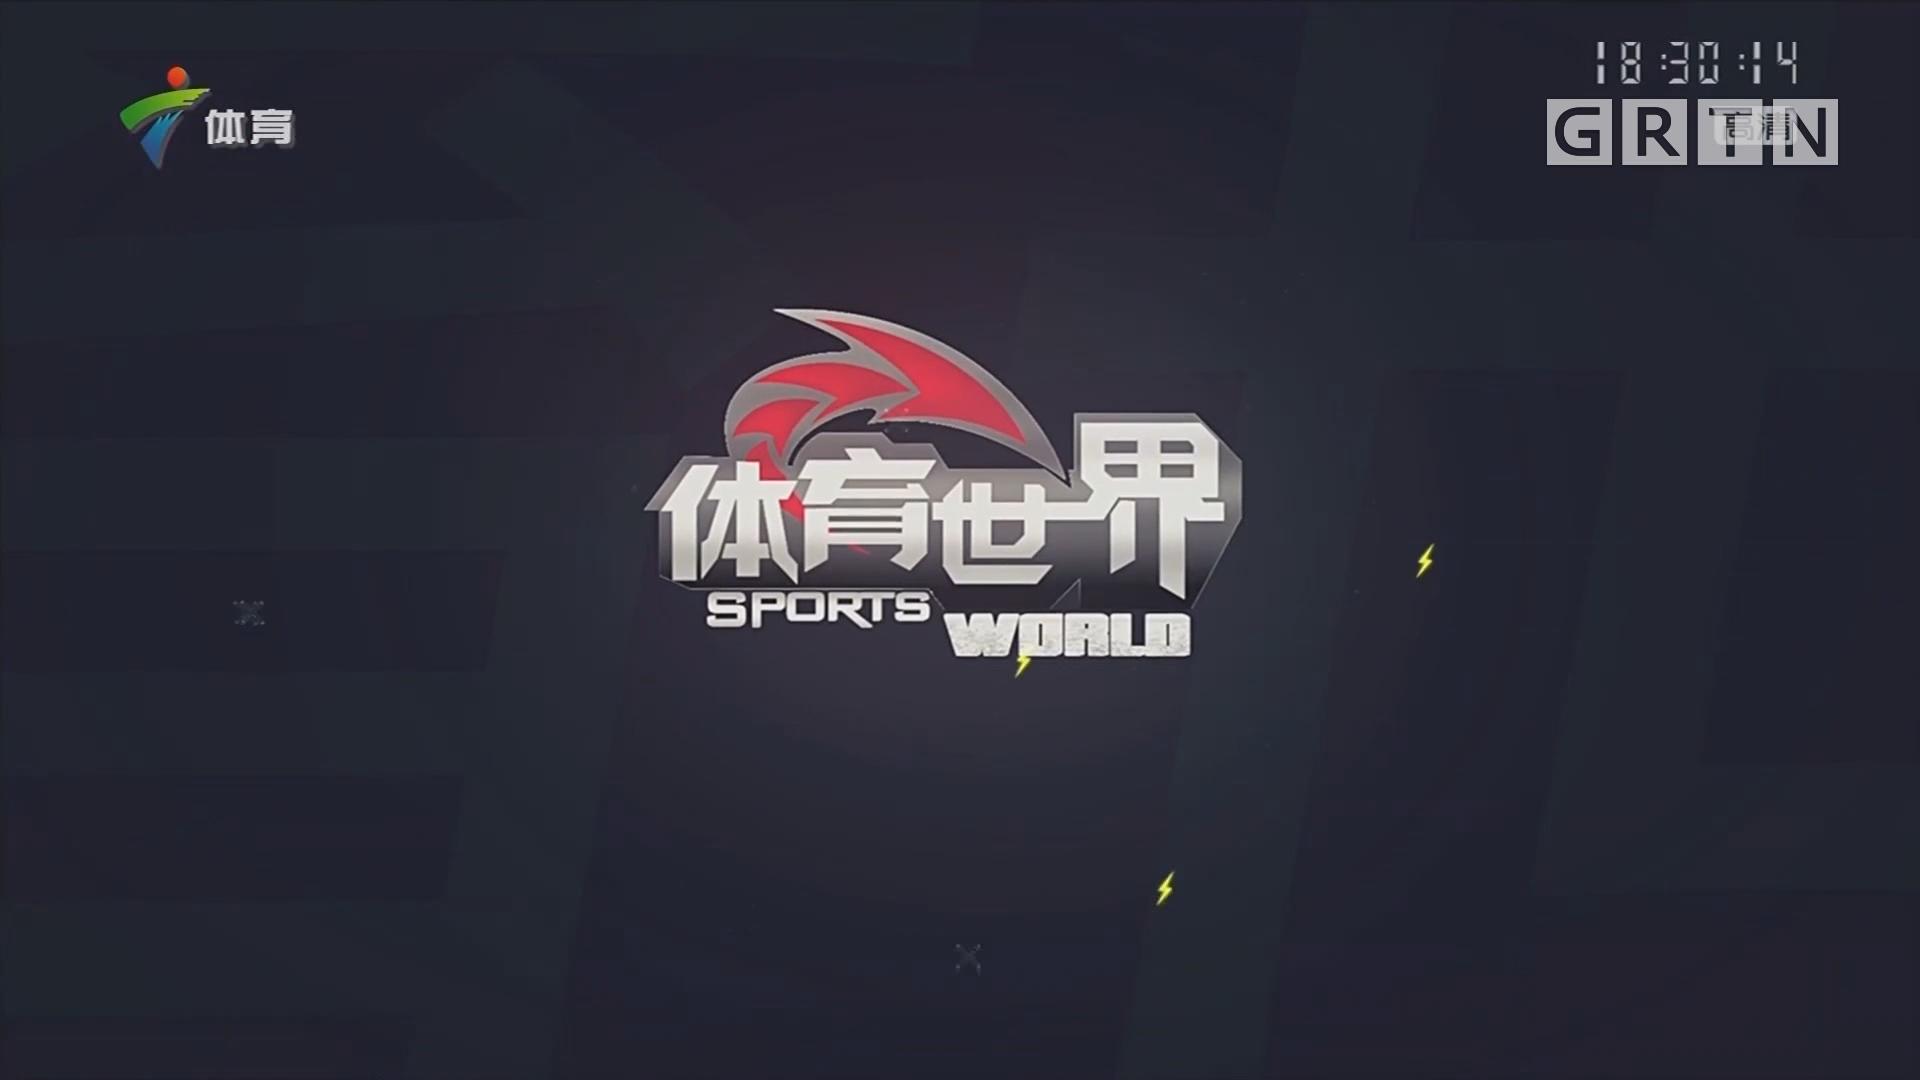 [HD][2019-03-18]体育世界:柔道教育进校园 奥运冠军展望全国柔道锦标赛